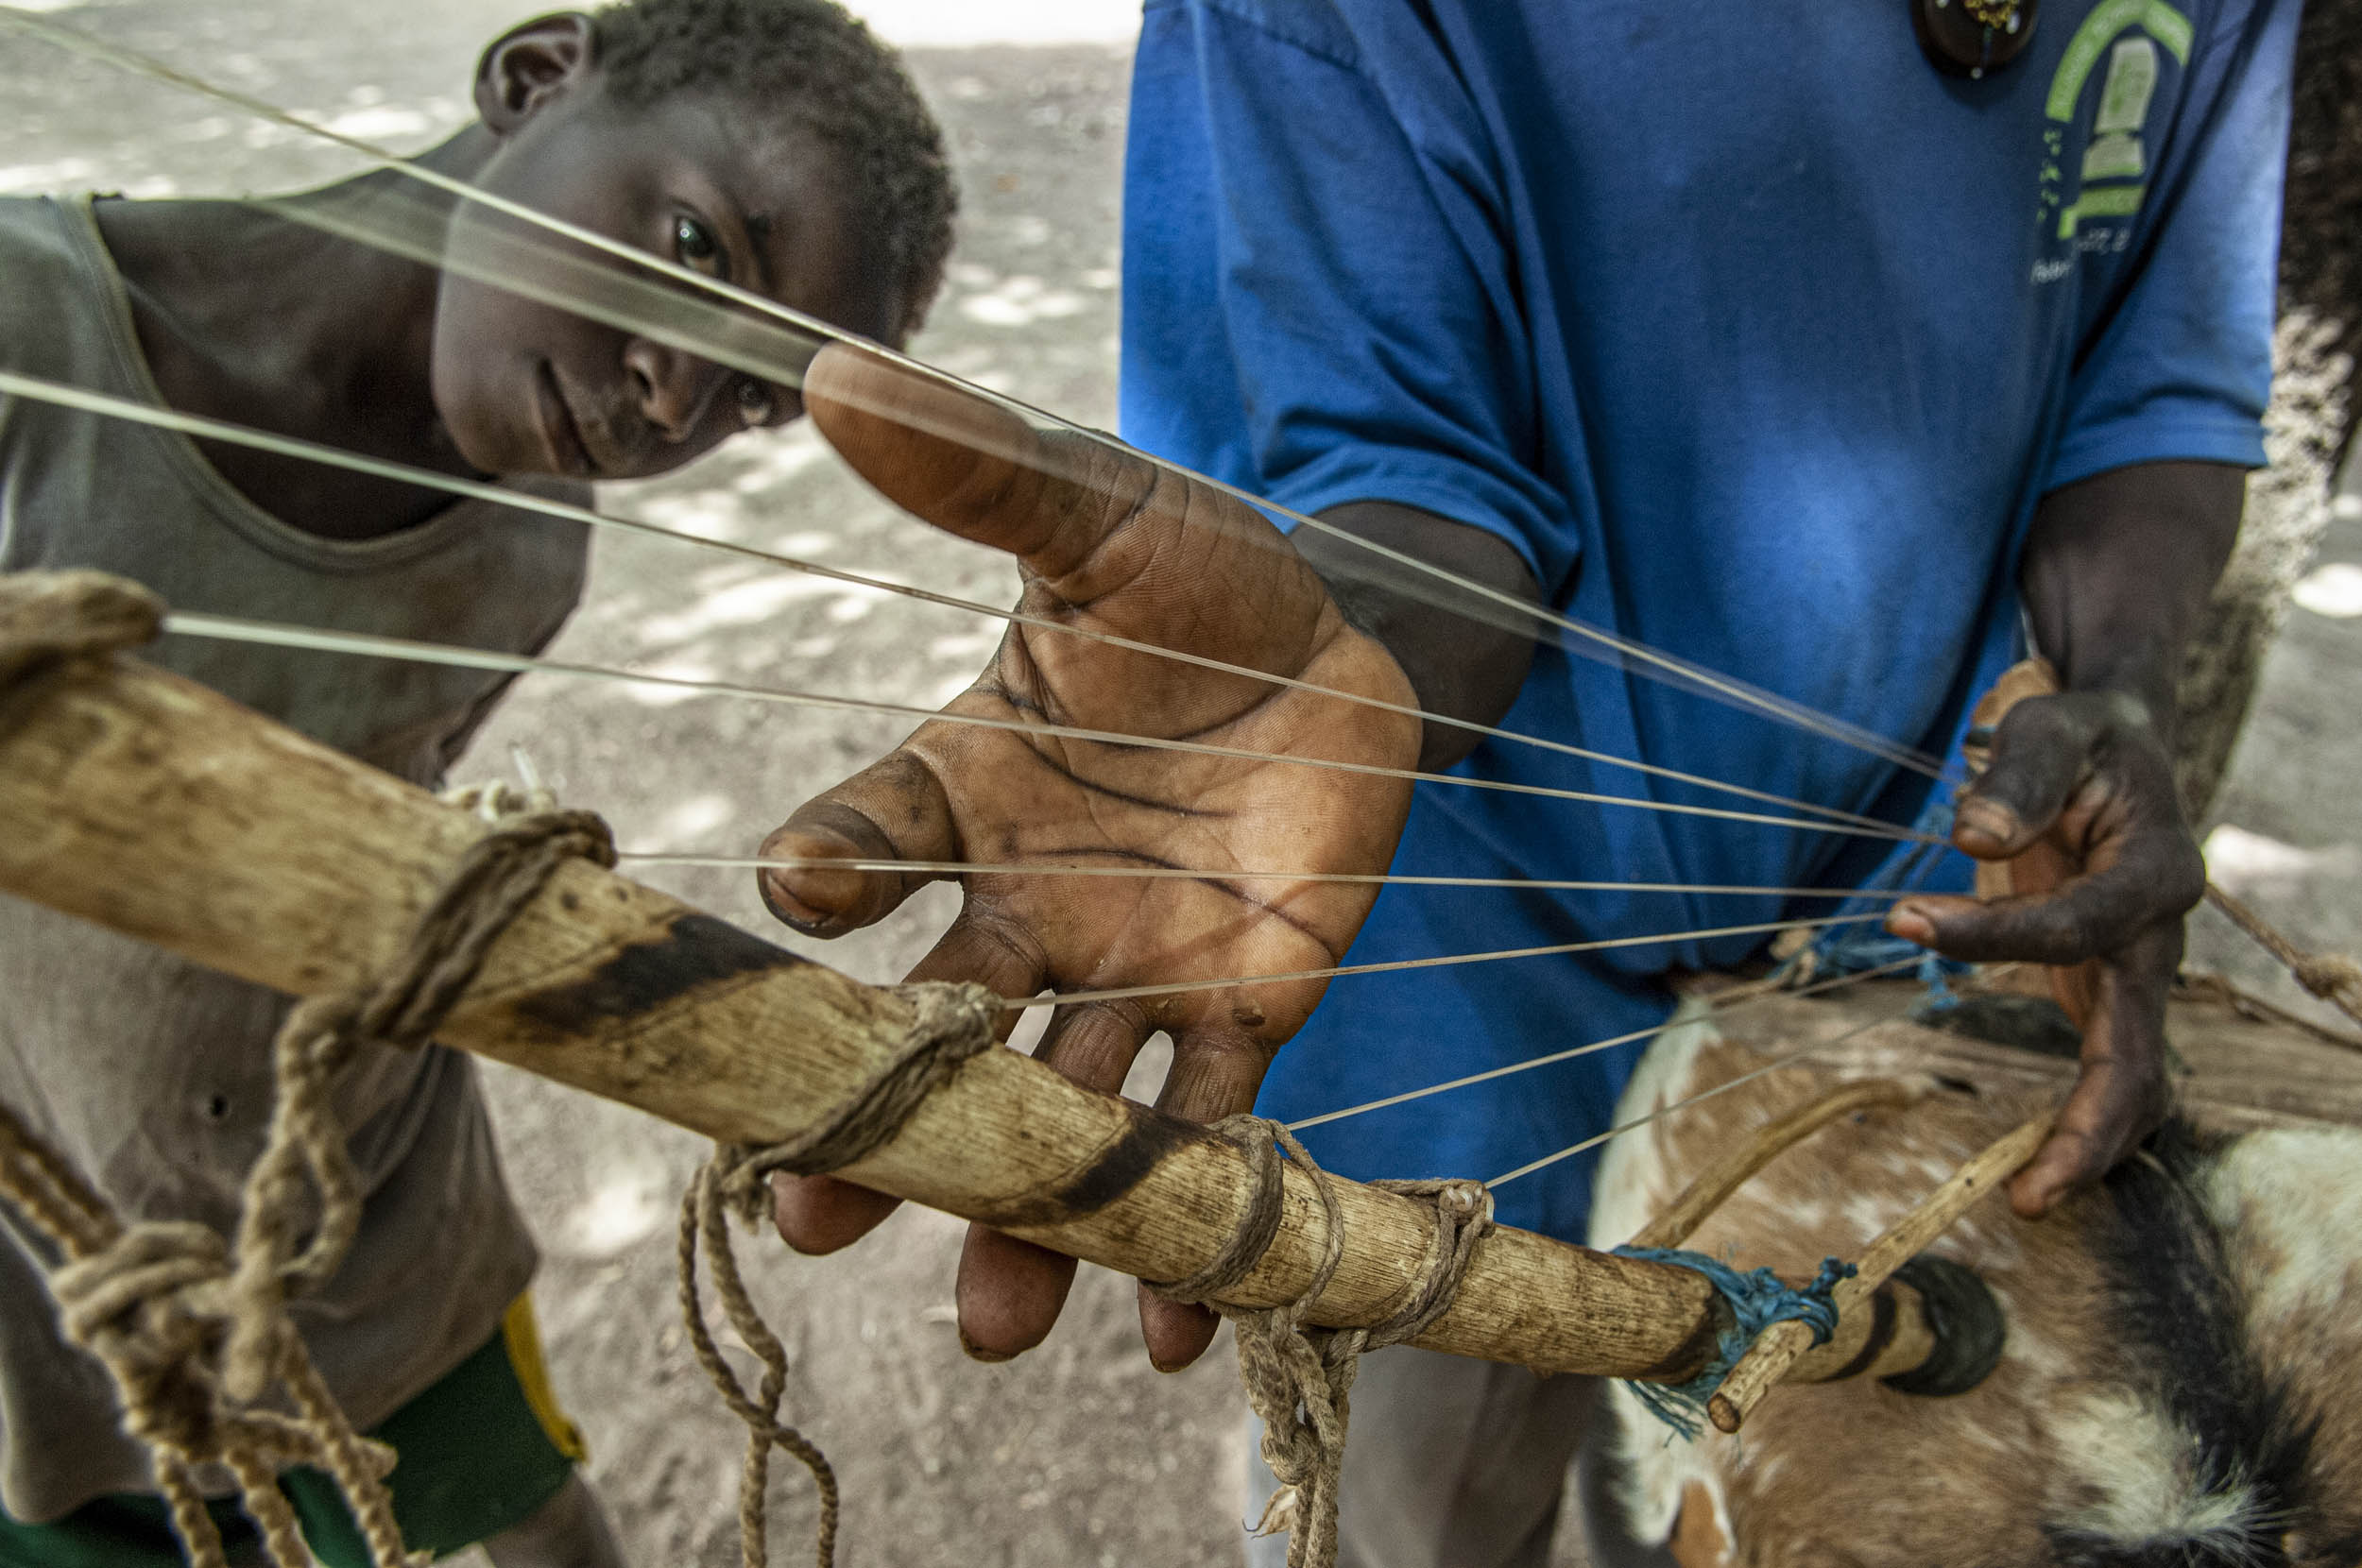 Kora, Burkina Faso - Ethnoland - Hector Garrido, Aerial and human photography